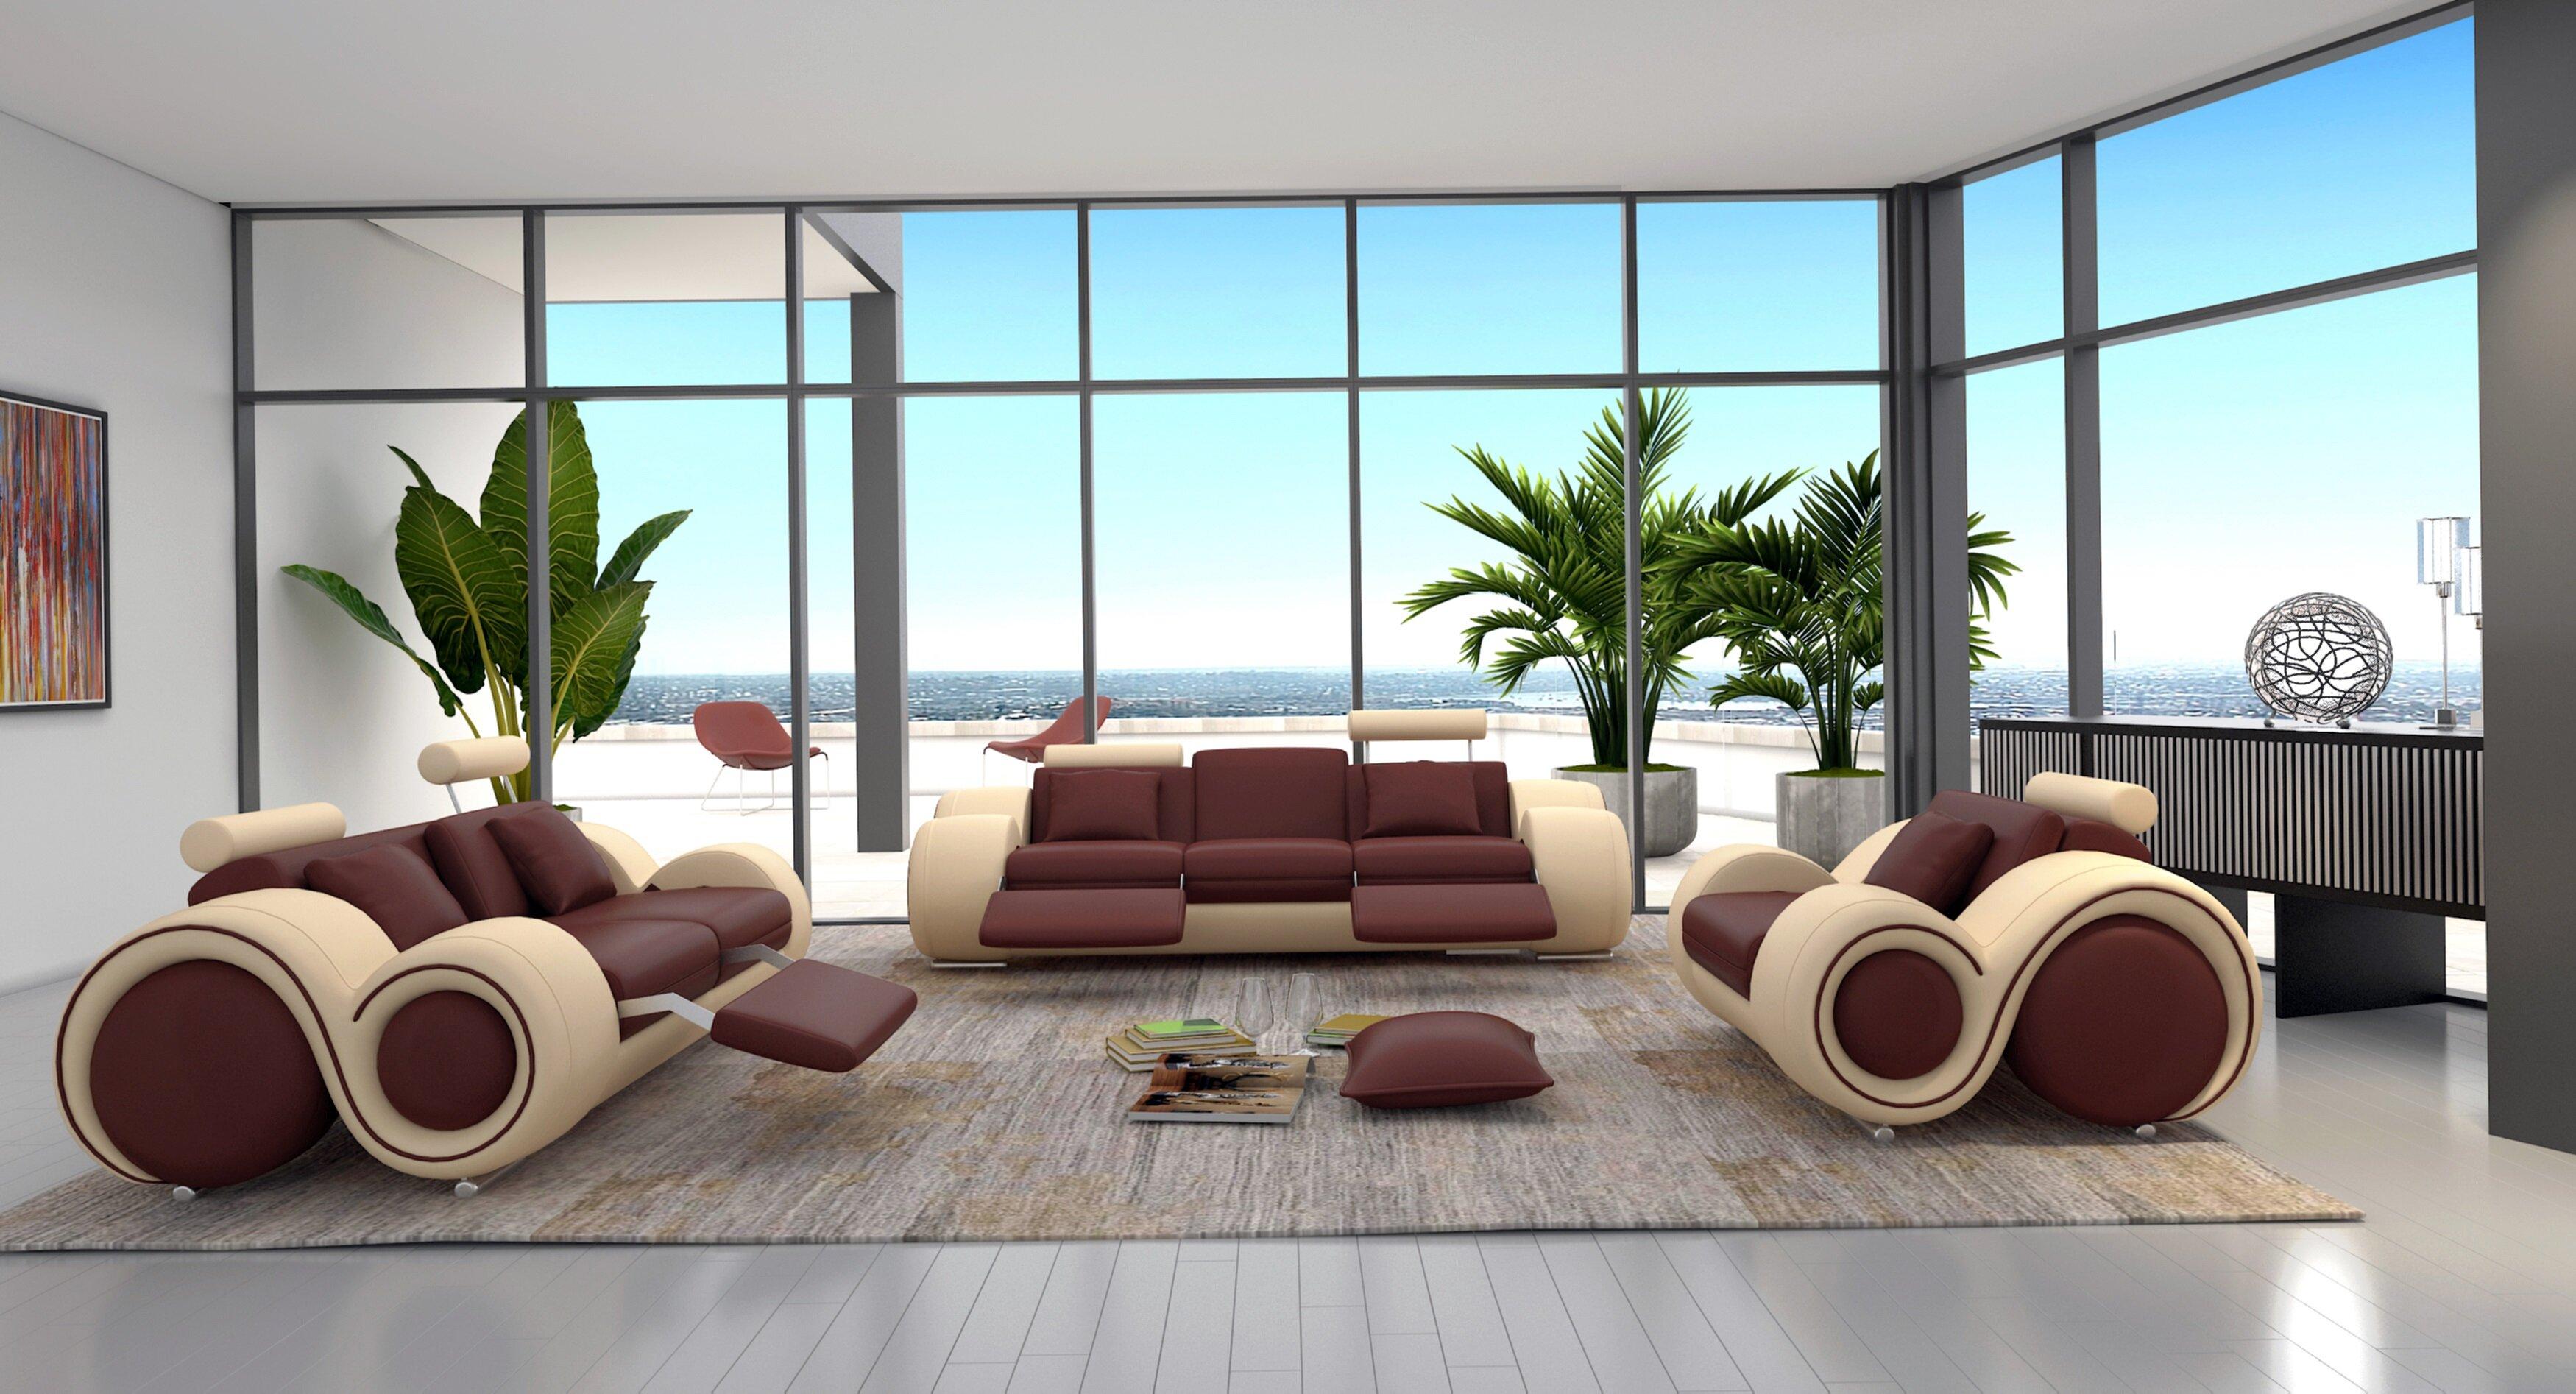 Orren Ellis Behr 3 Piece Leather Living Room Set & Reviews | Wayfair